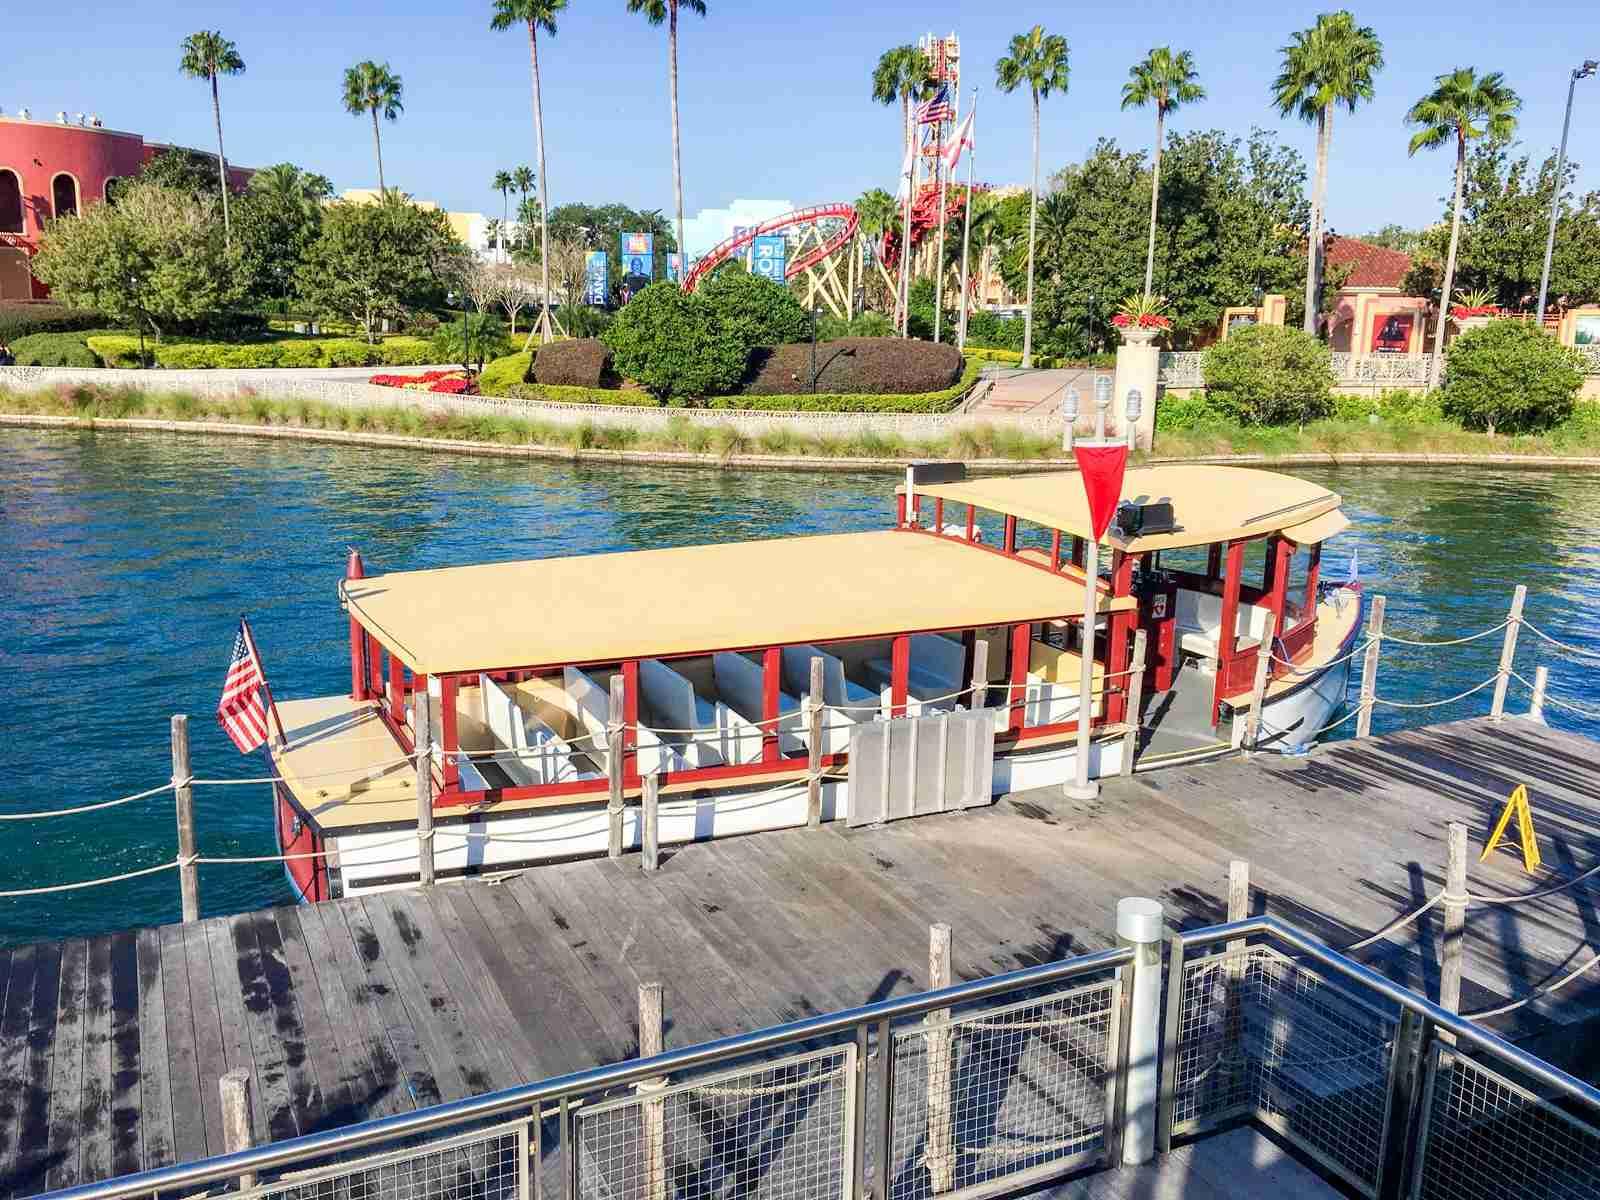 Boat shuttle at Universal Orlando